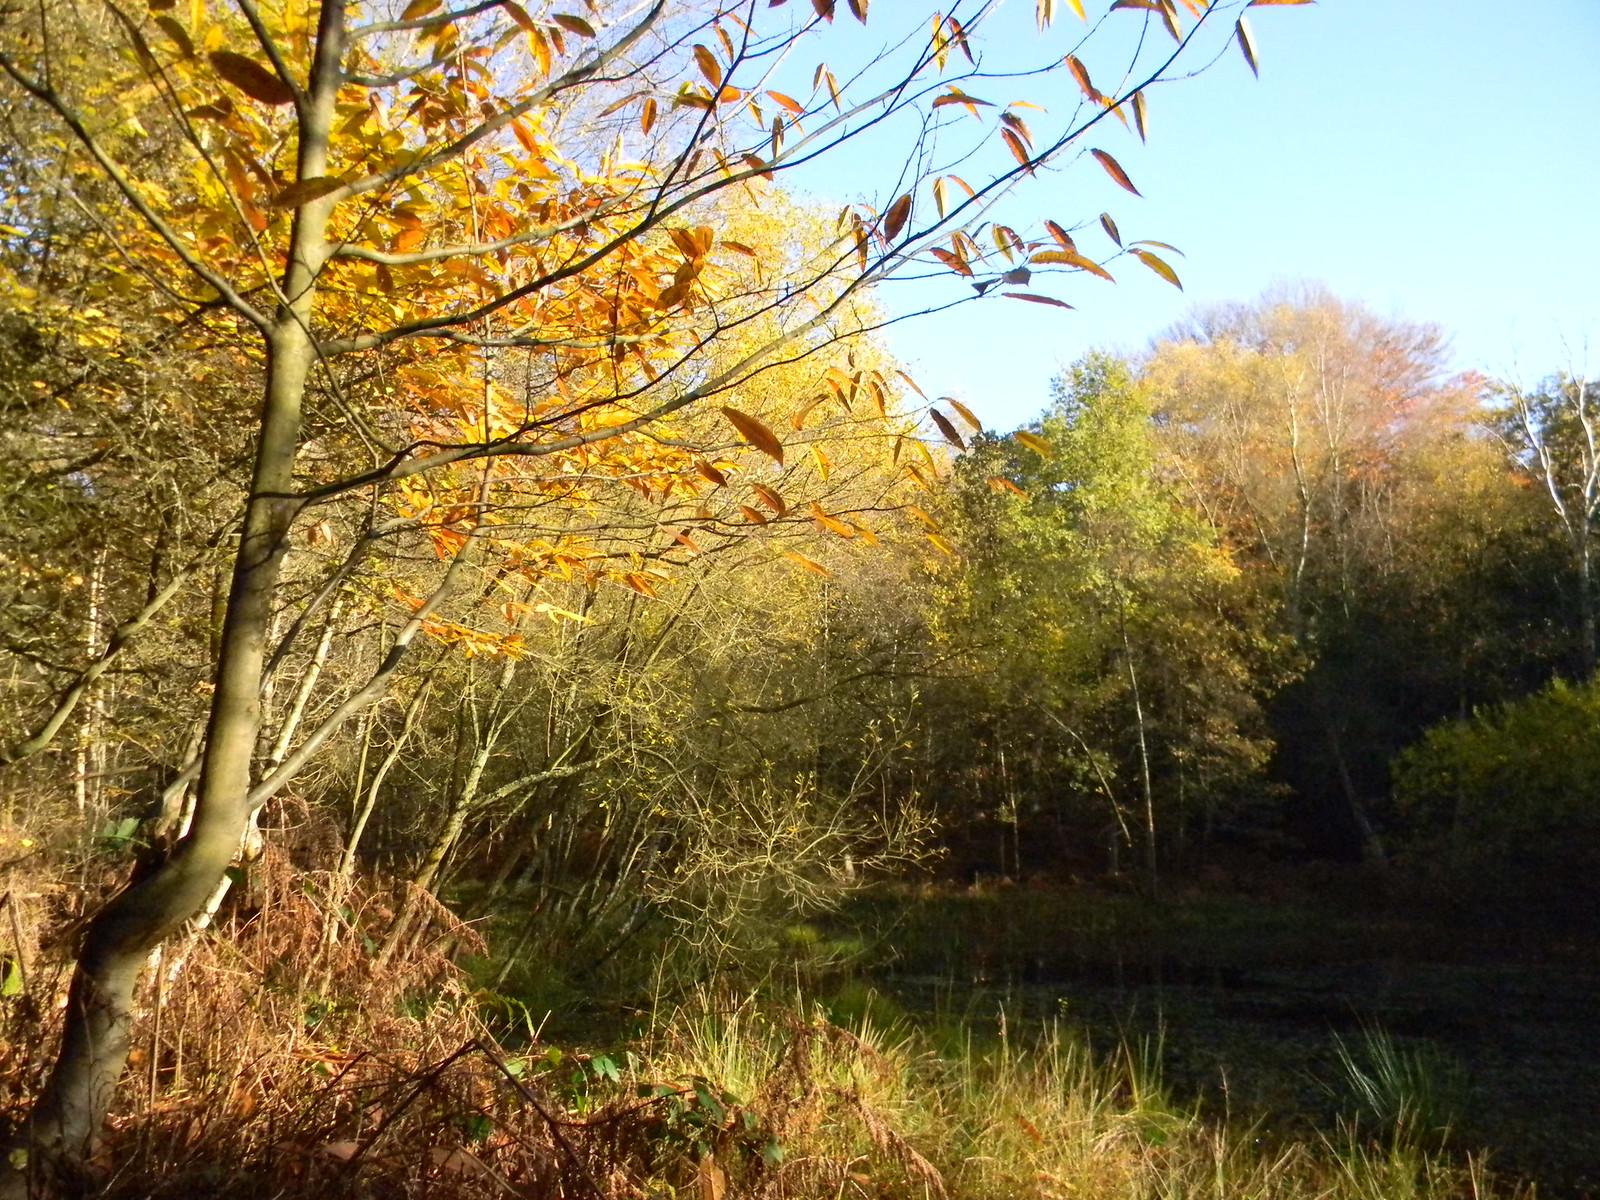 Pond Crowthorne to Sandhurst (avoiding Eversley)